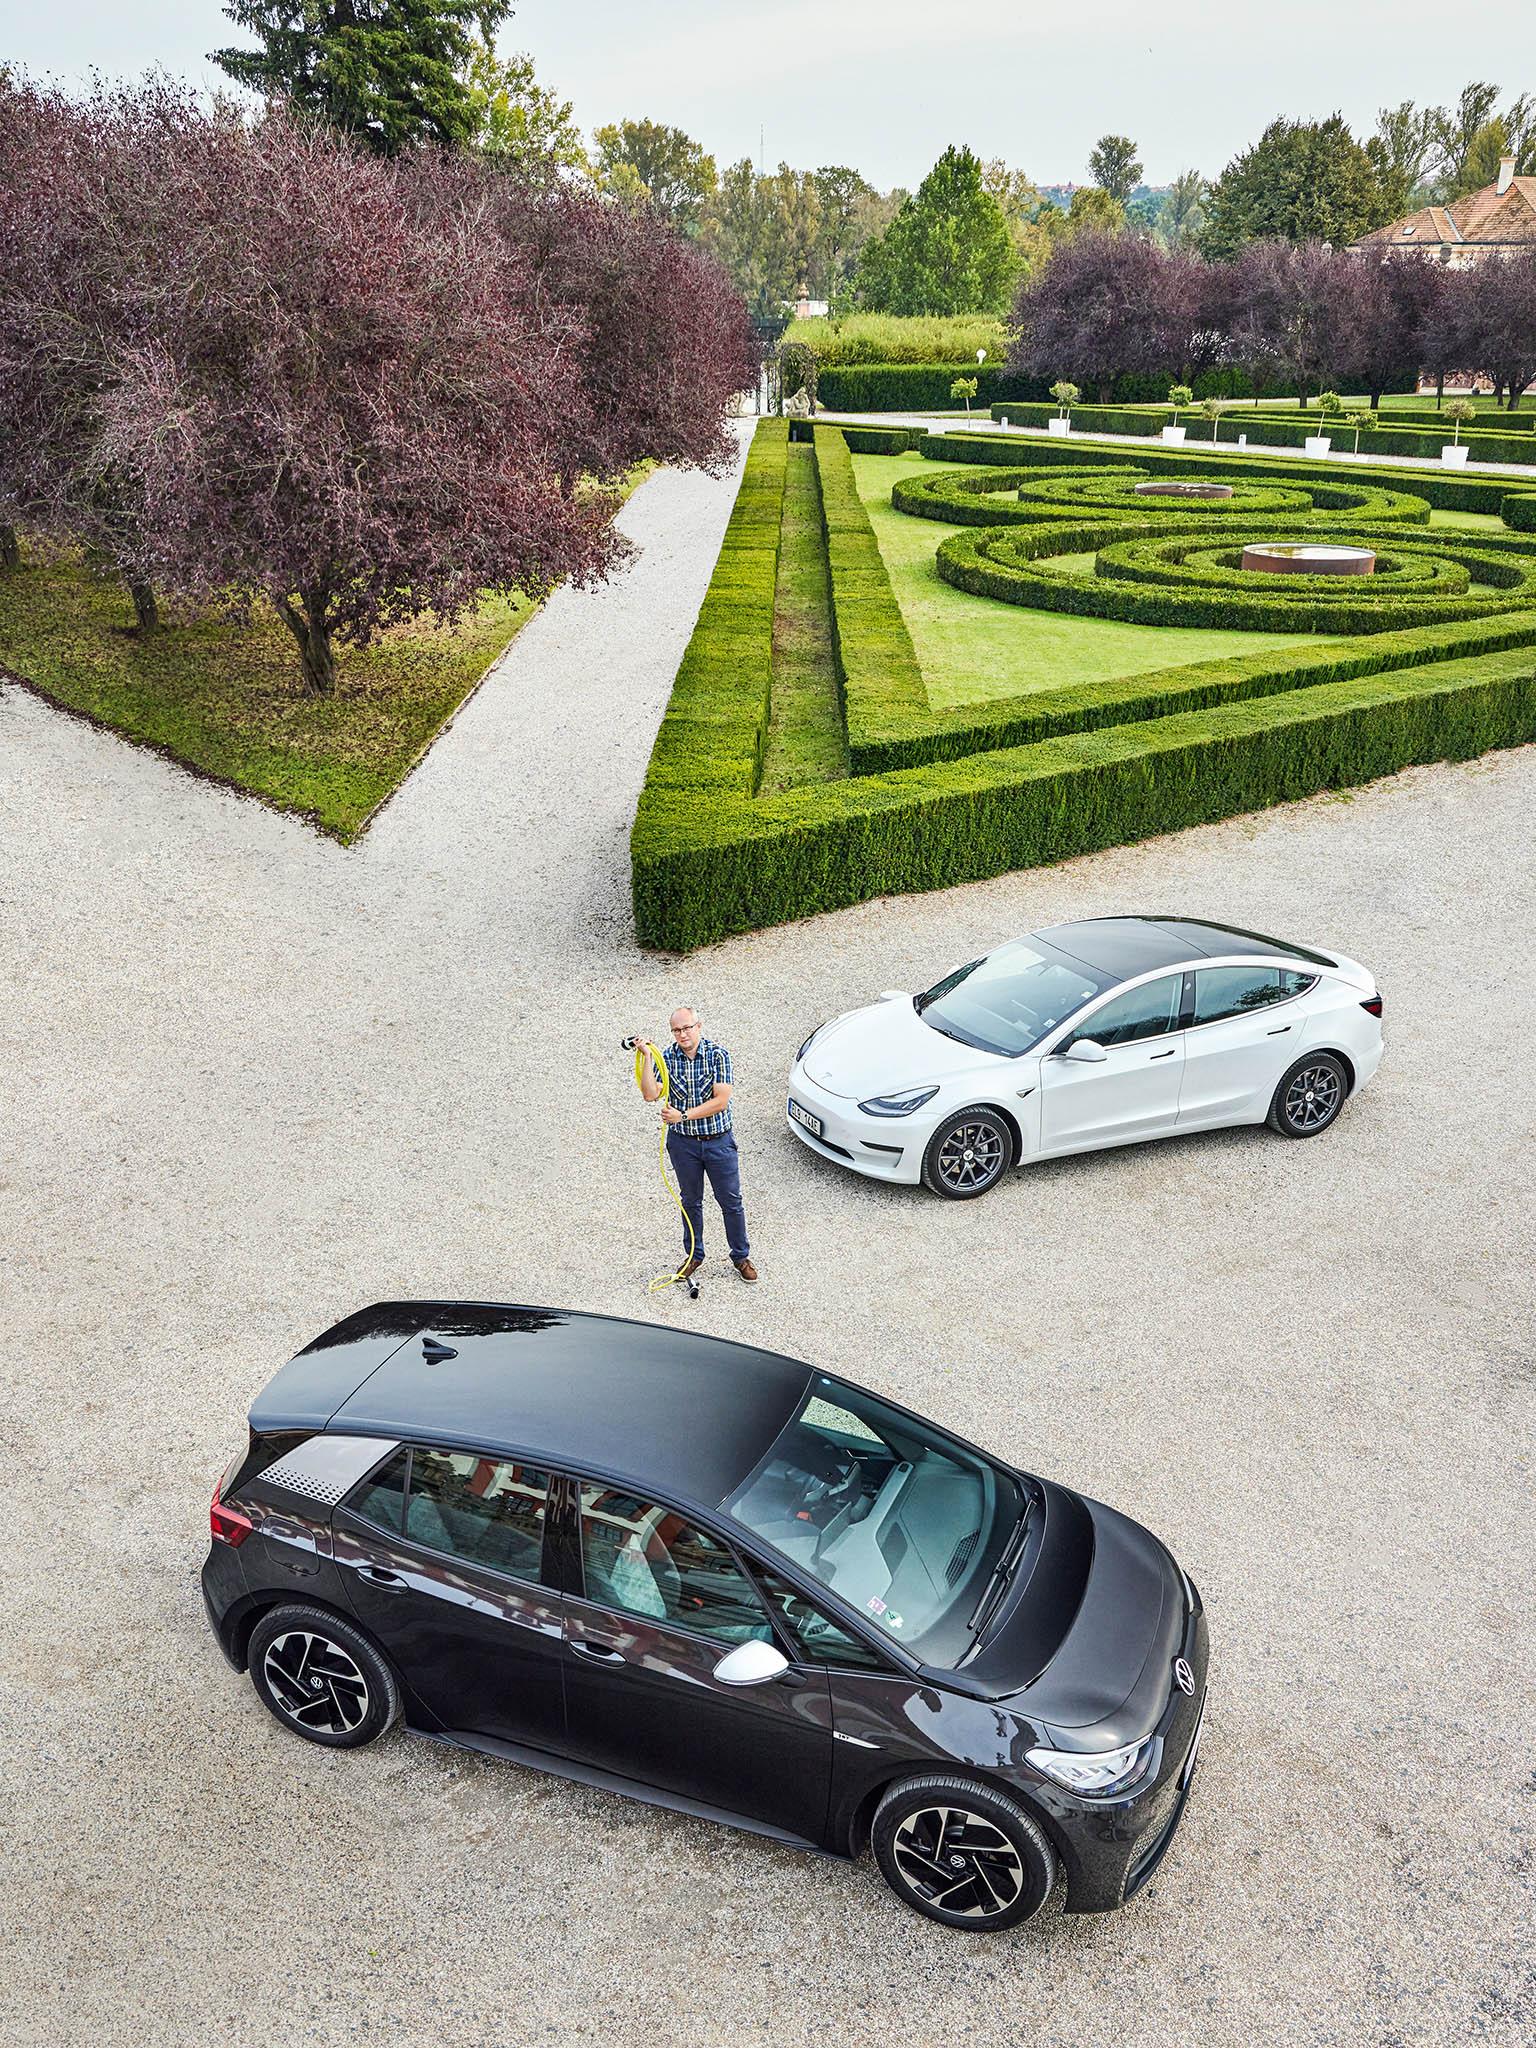 Martin Přibyl: Volkswagen ID.3, Tesla Model 3 Long Range Dual Motor